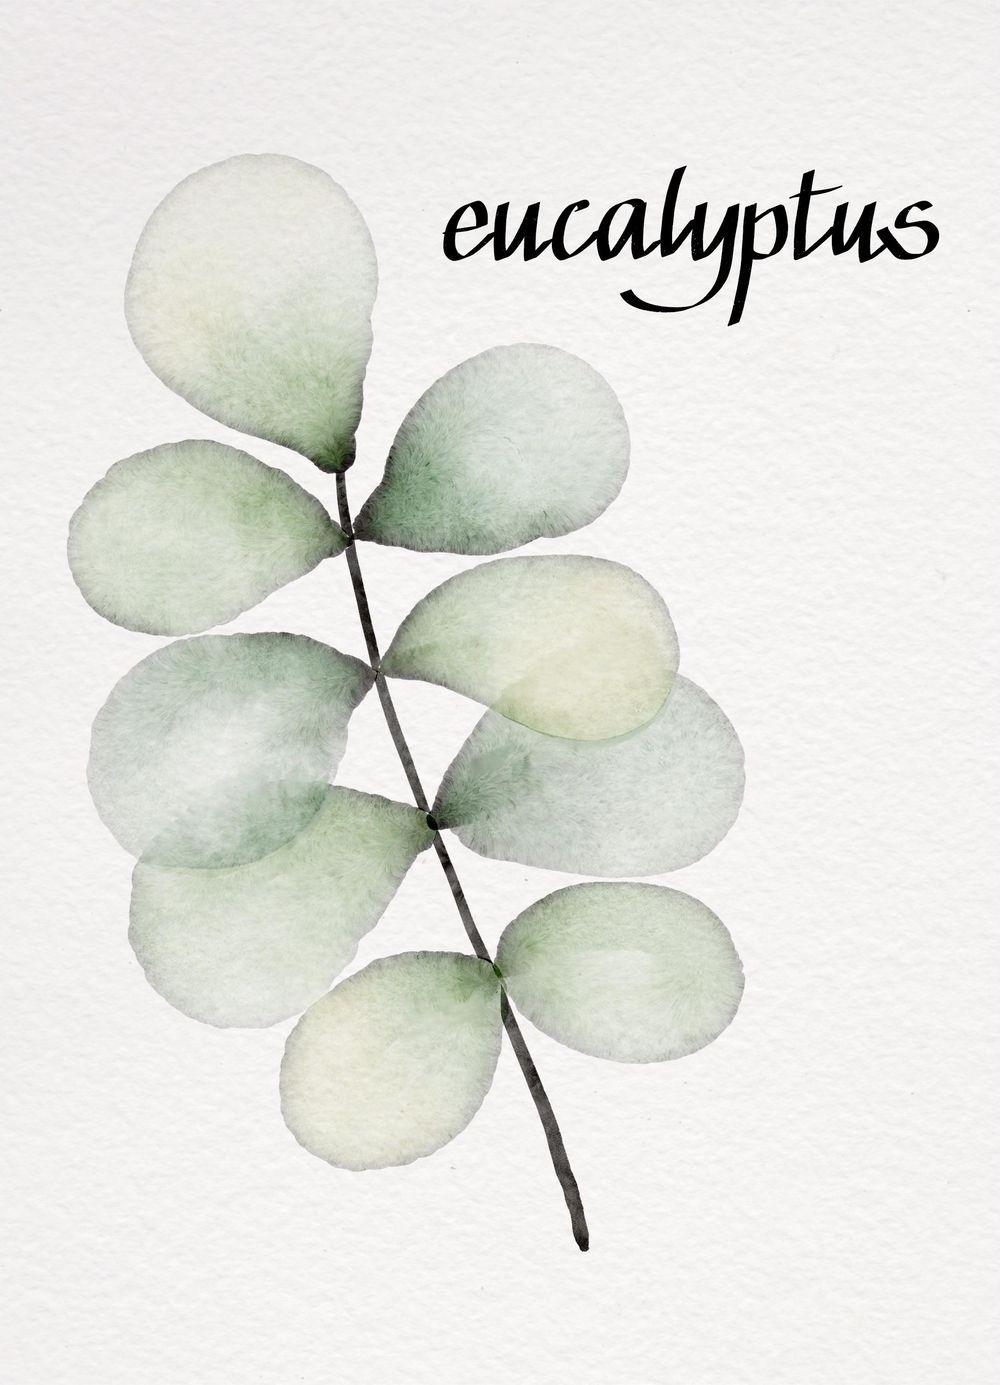 My Botanicals - image 1 - student project